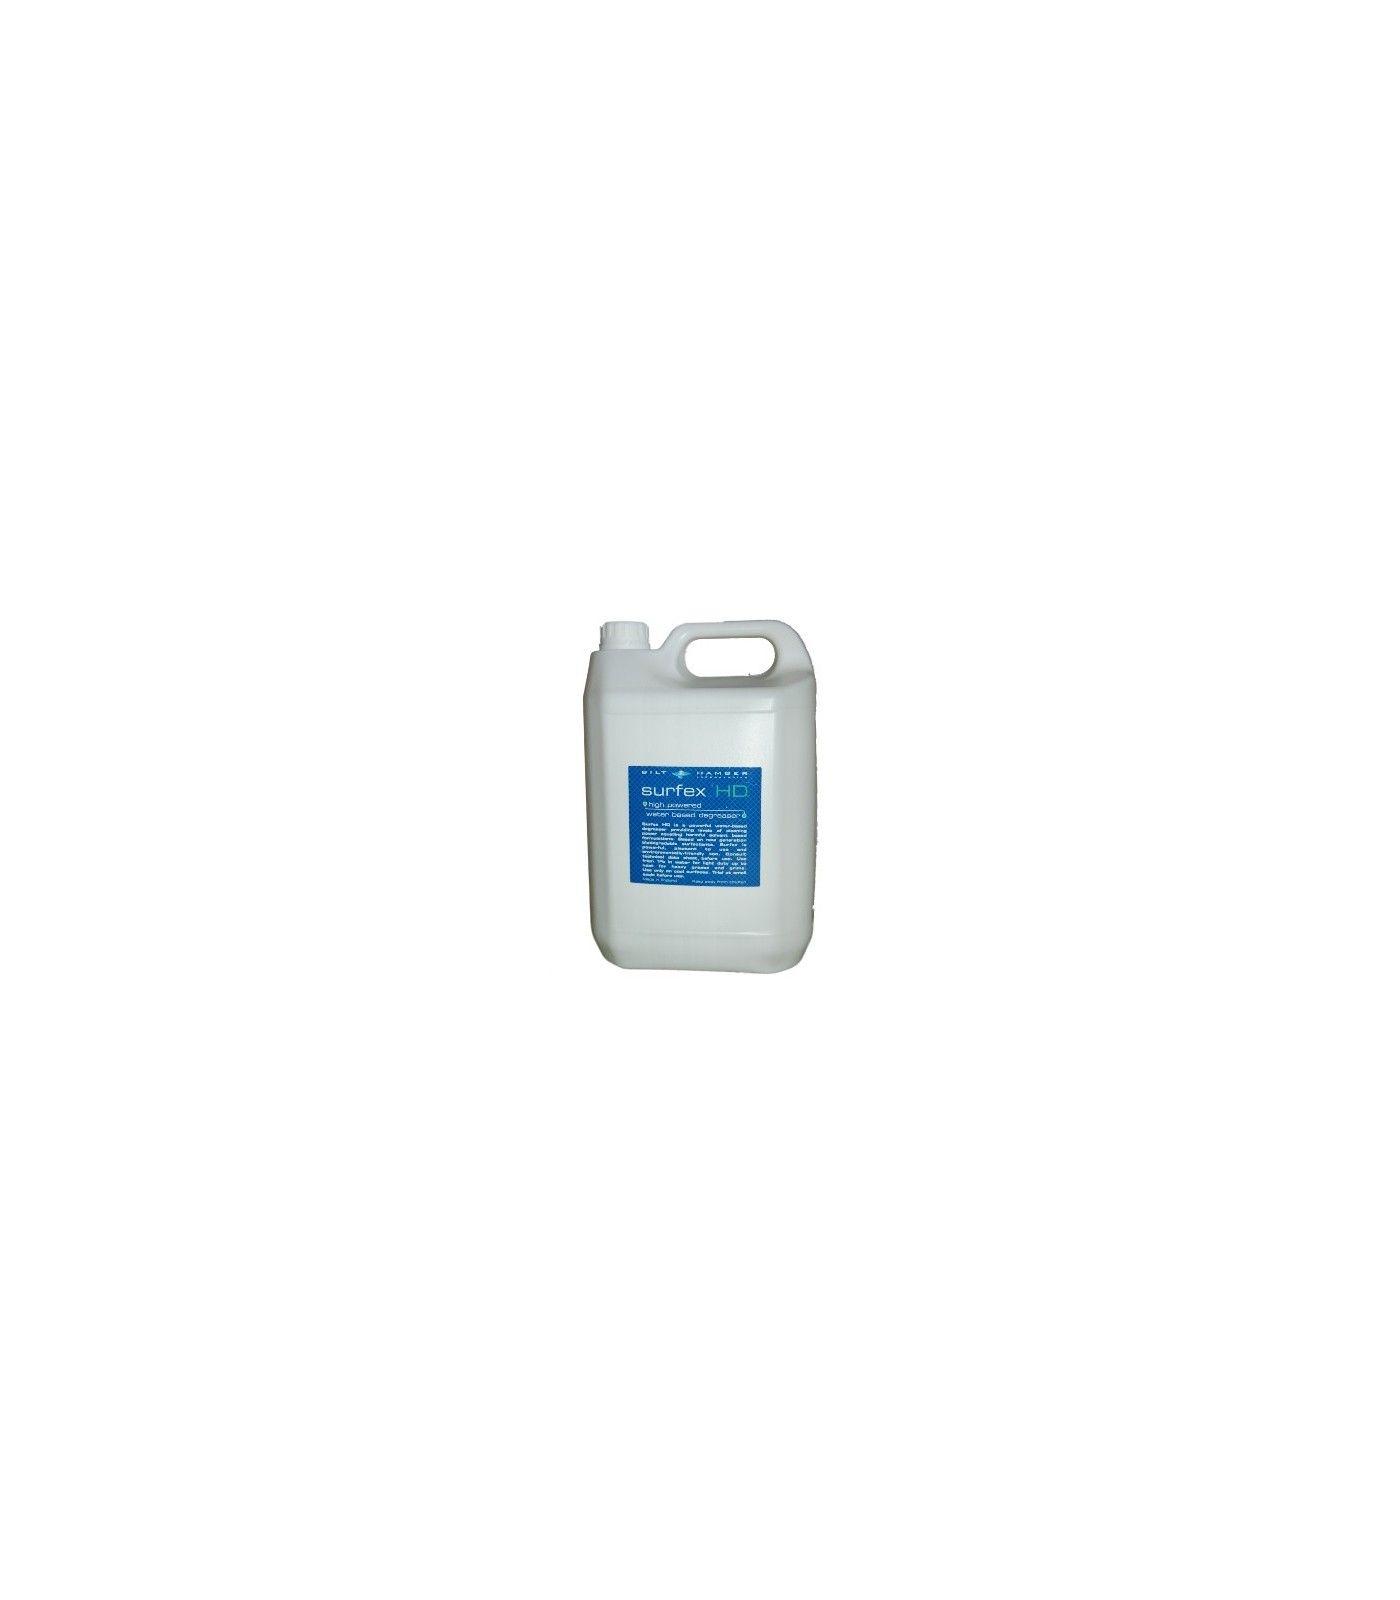 Bilt-Hamber Surfex-HD - 500 ml - All Purpose Cleaner/Degreaser - APC